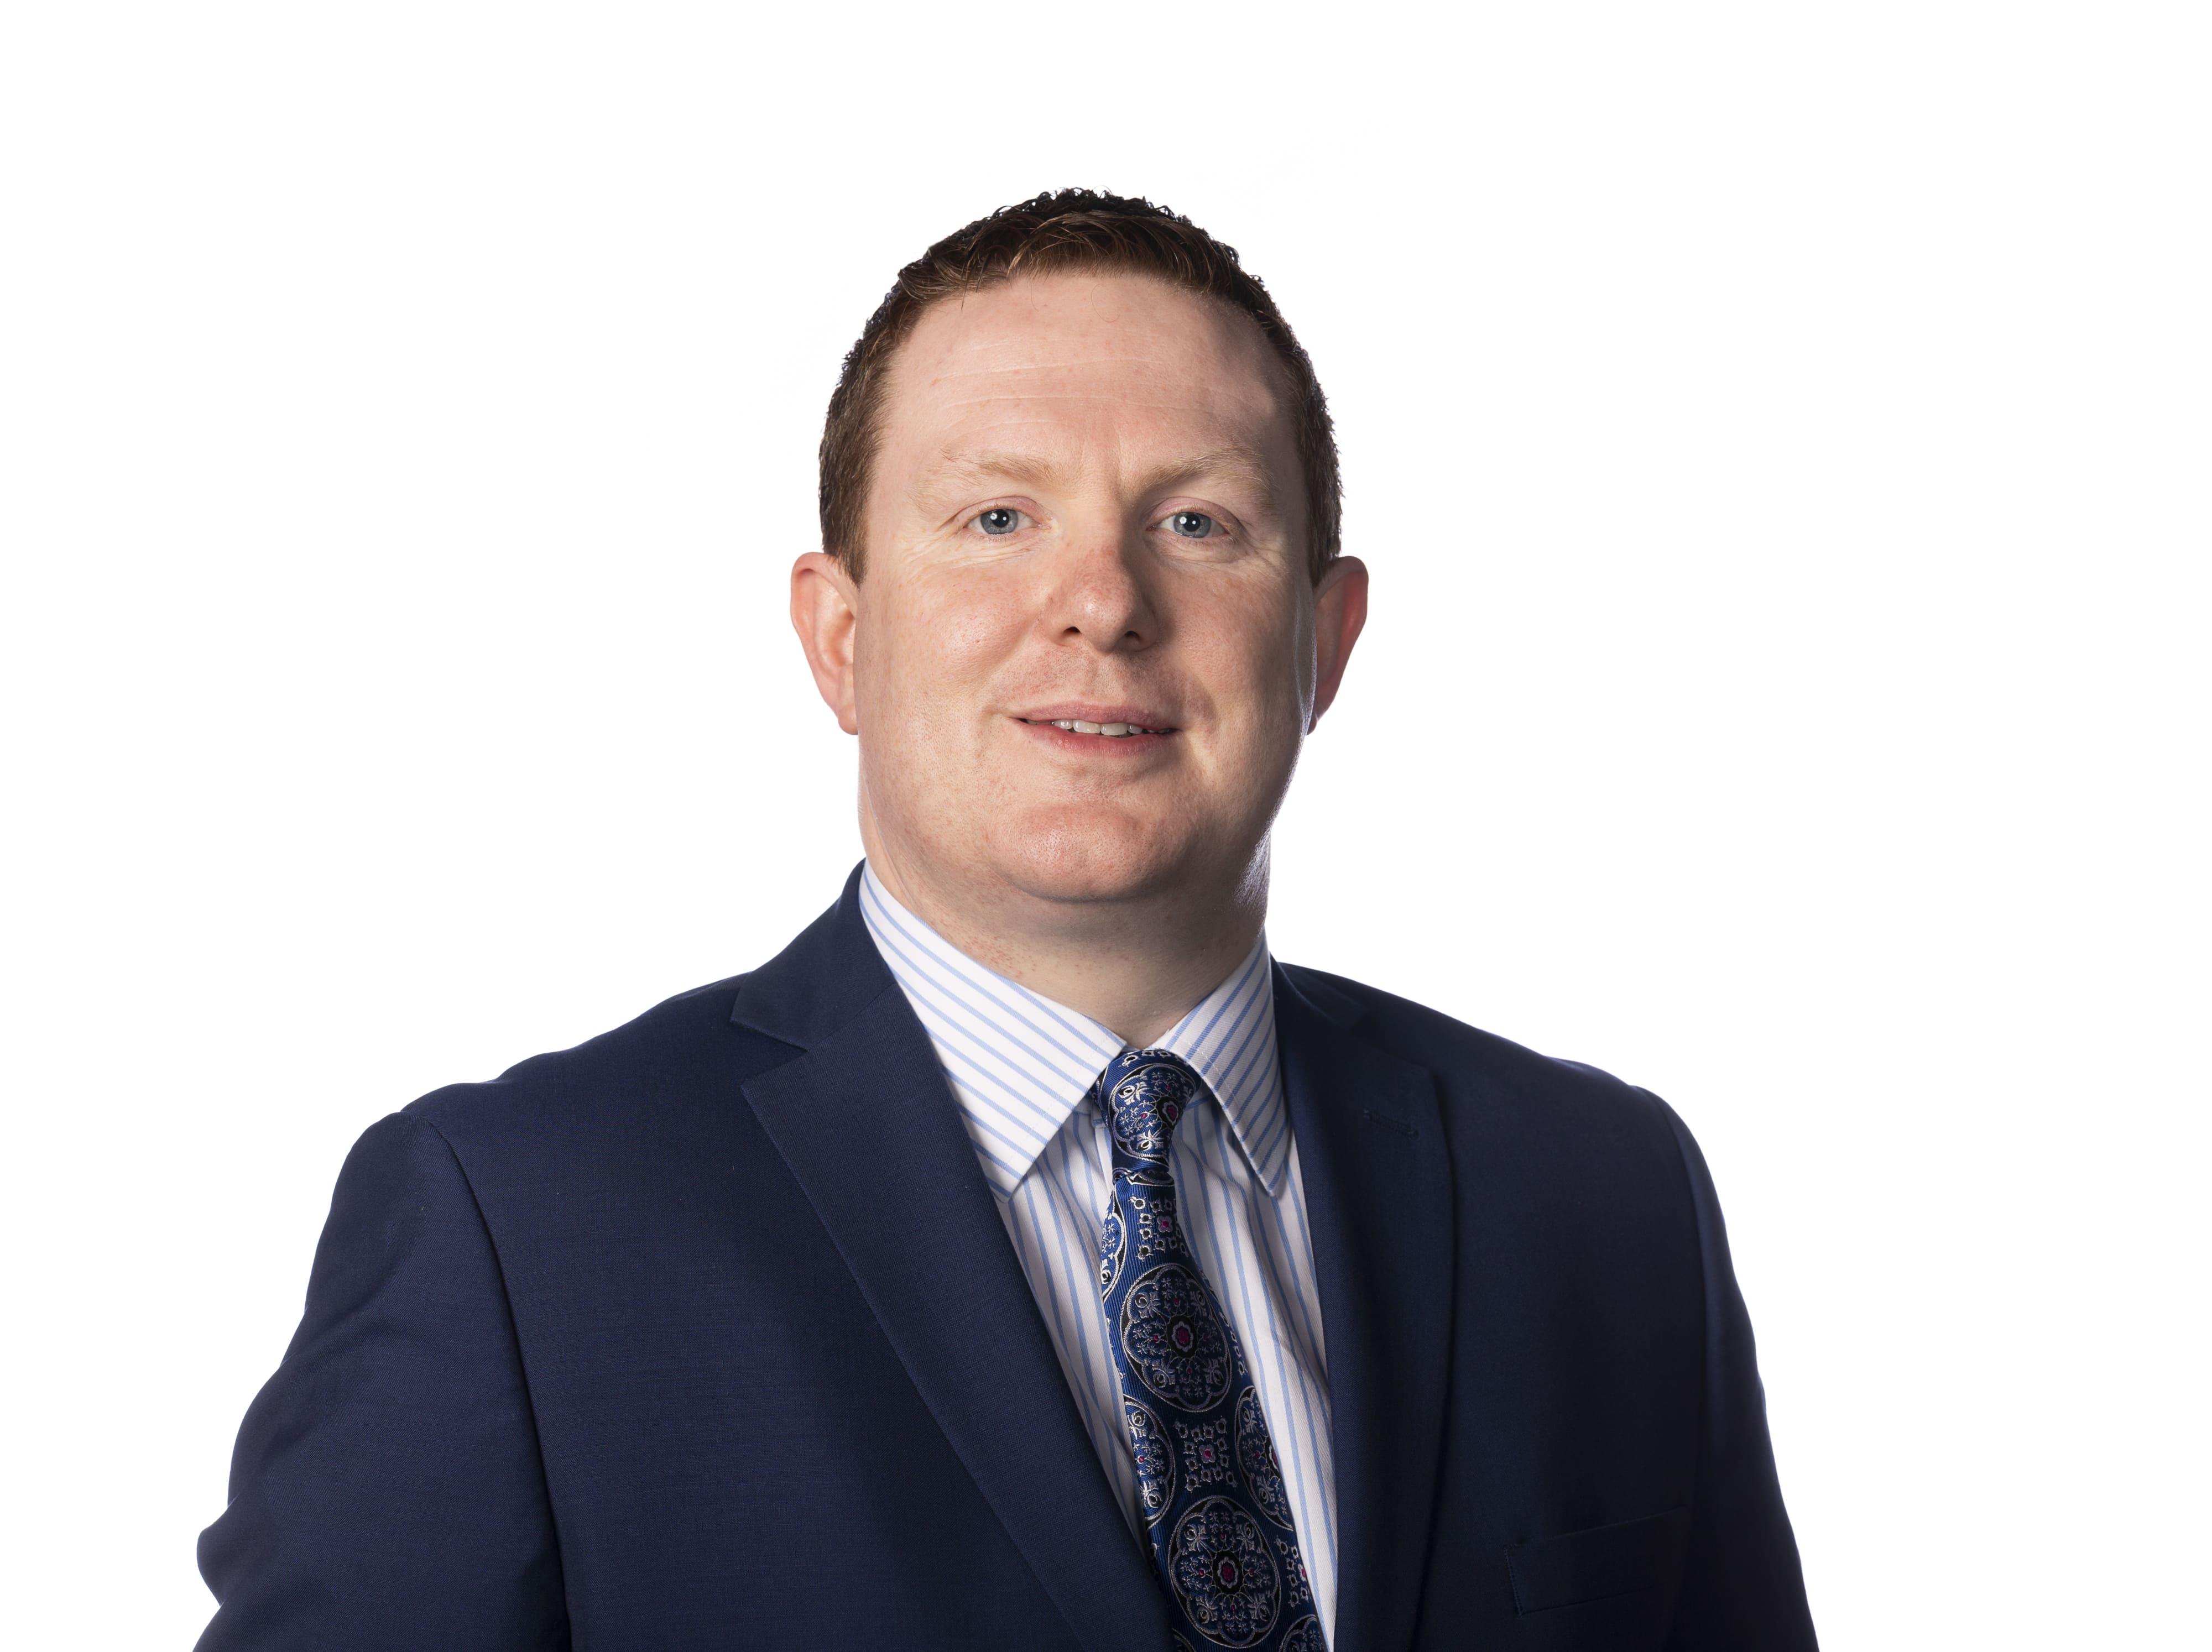 James Meighan